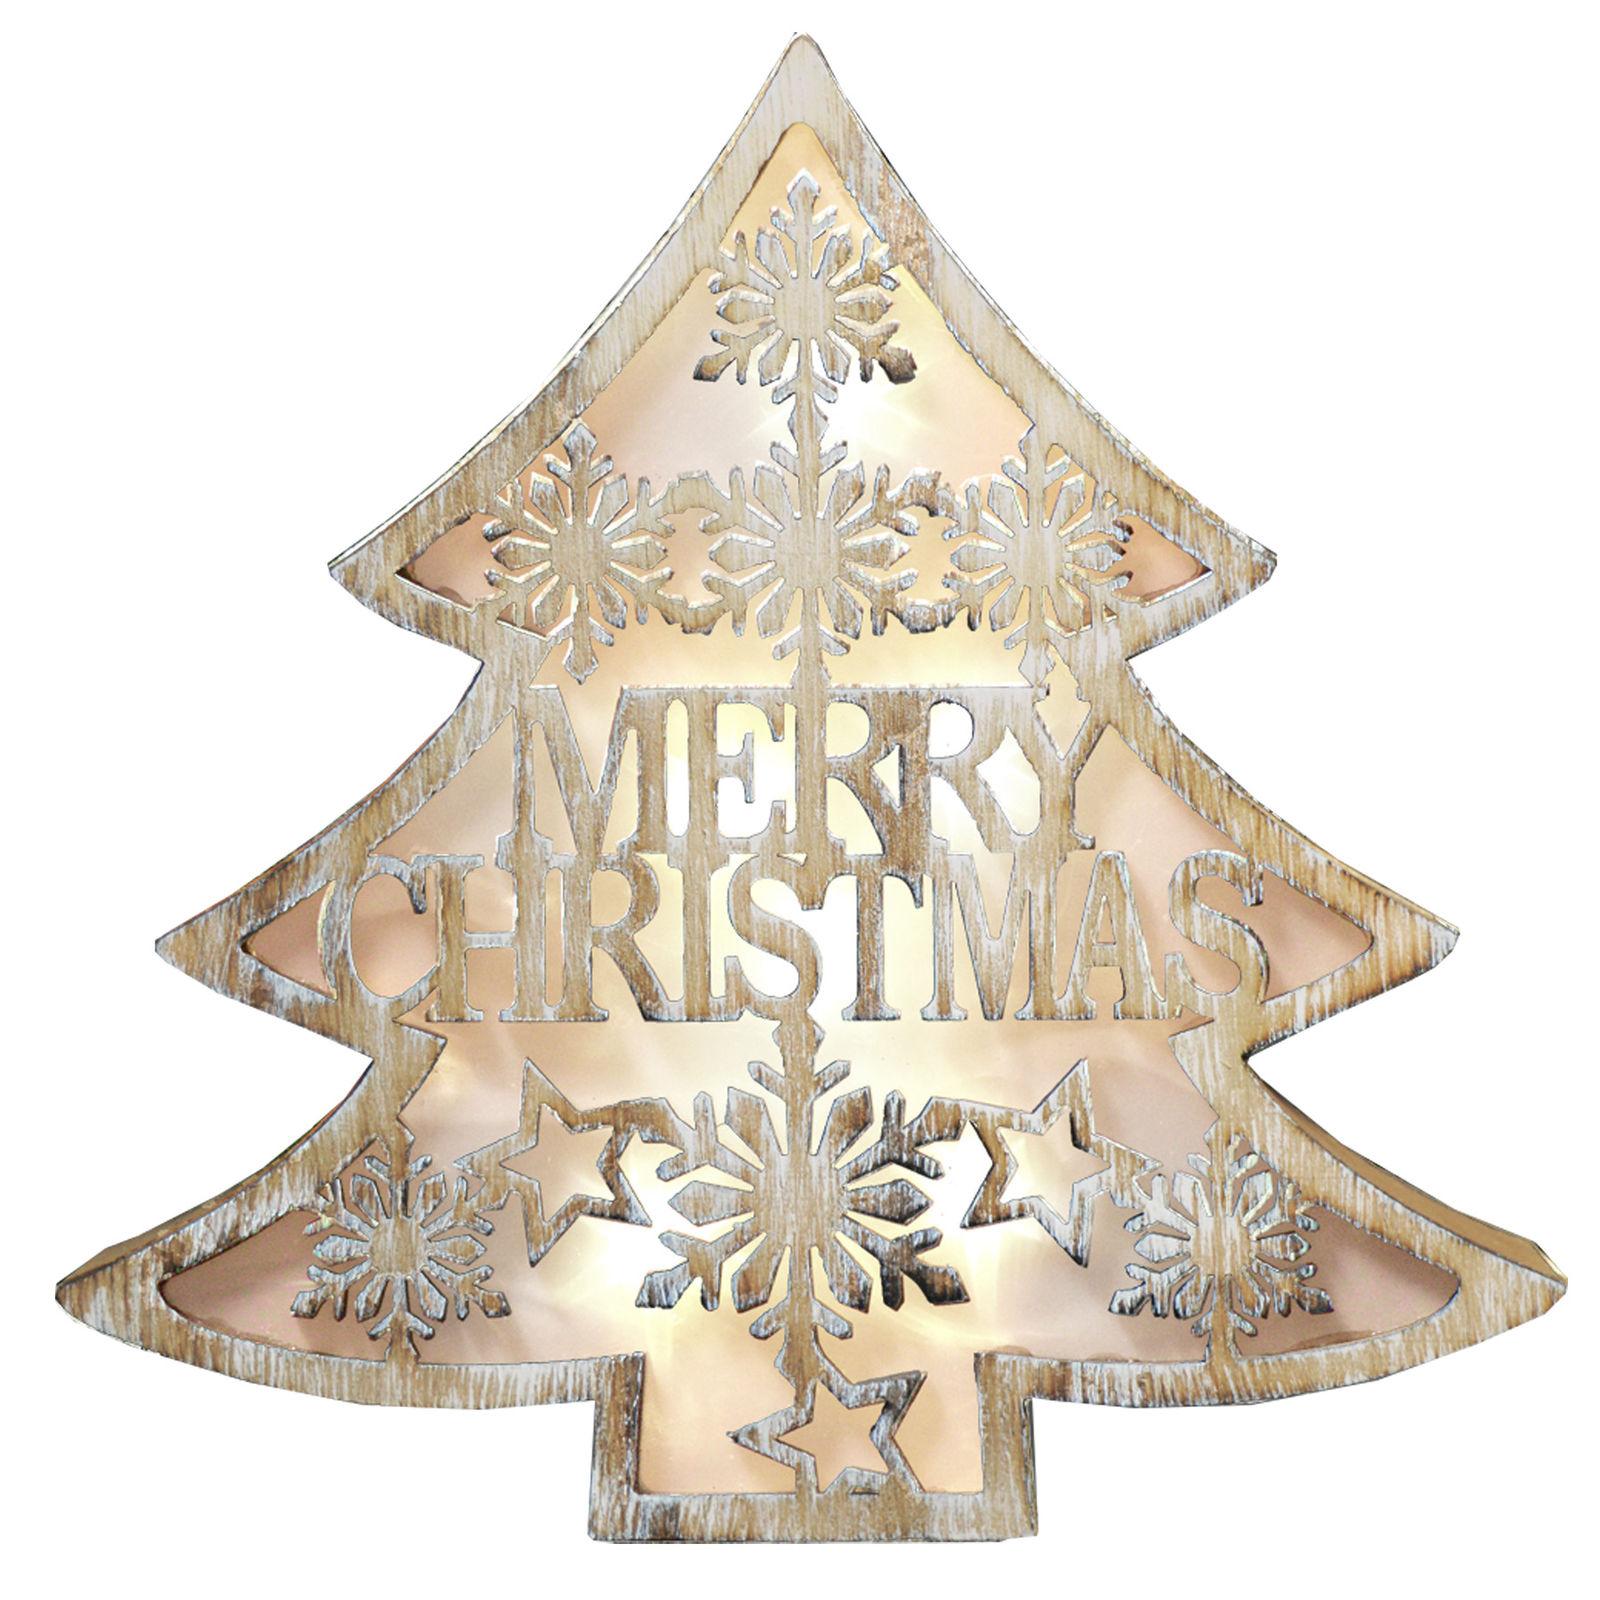 Home Furniture Diy Other Christmas Decorations Theme Machine Led Christmas Wooden Light 24cm Merry Christmas Nativity Star Tree Bortexgroup Com